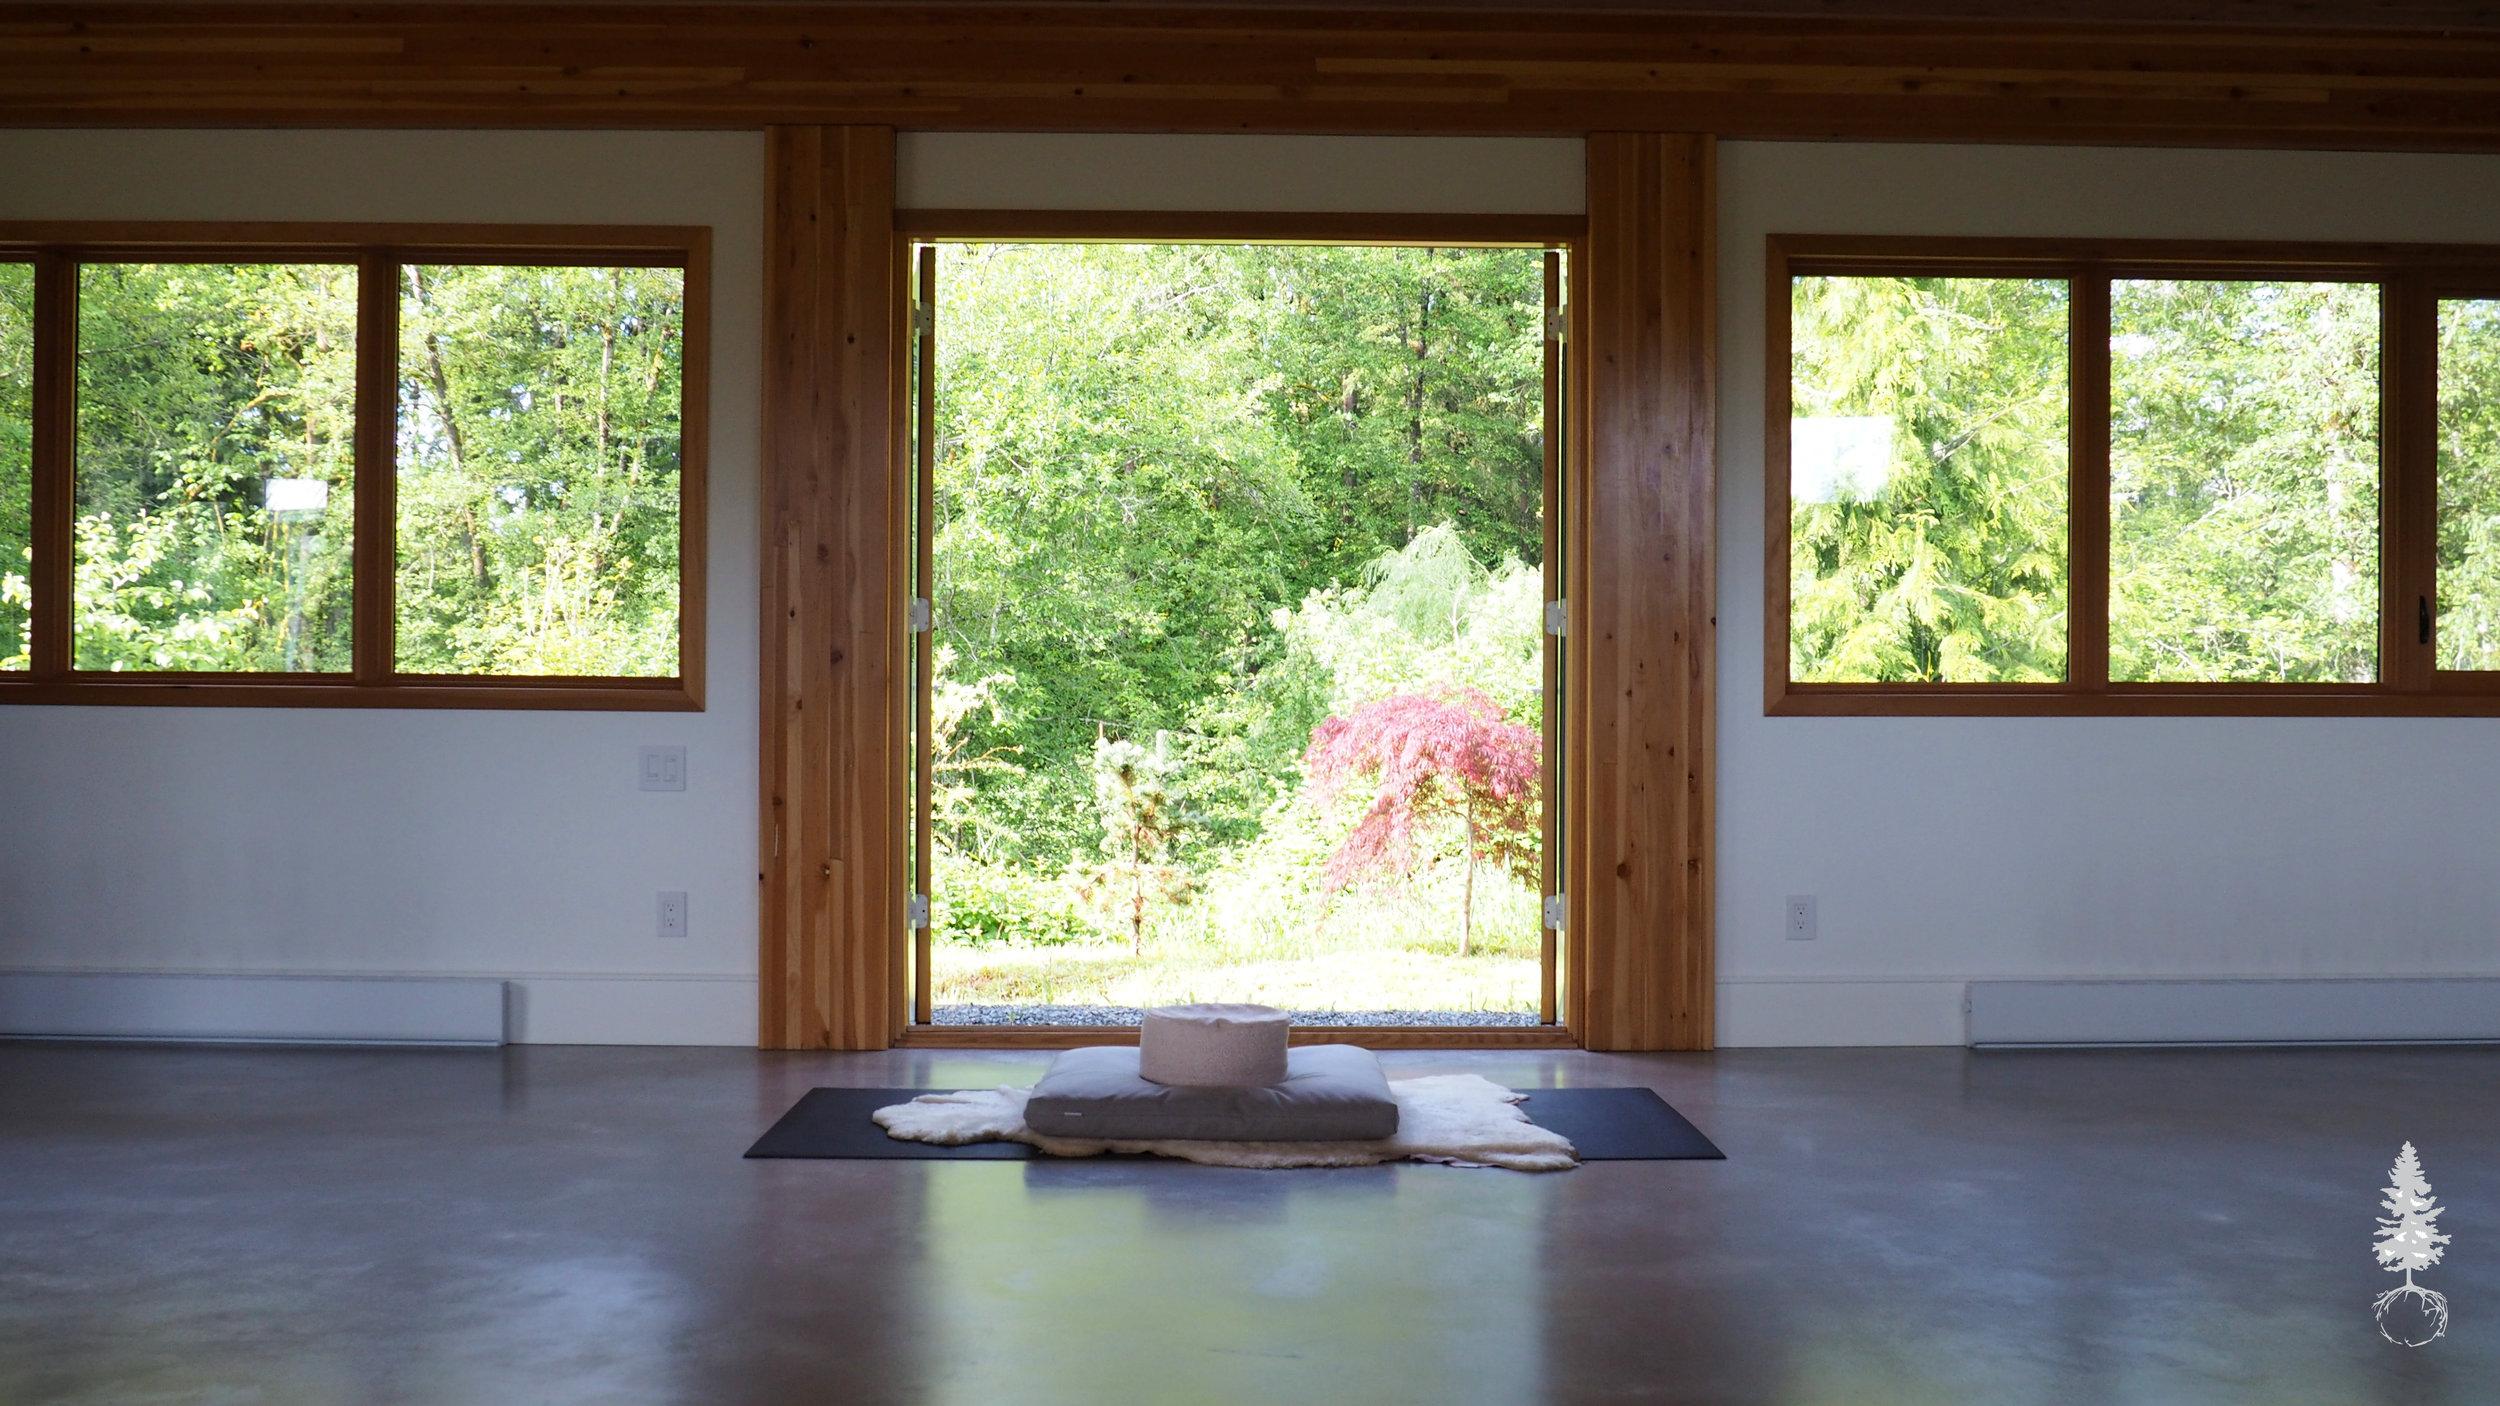 4 studio interior 2019.jpg